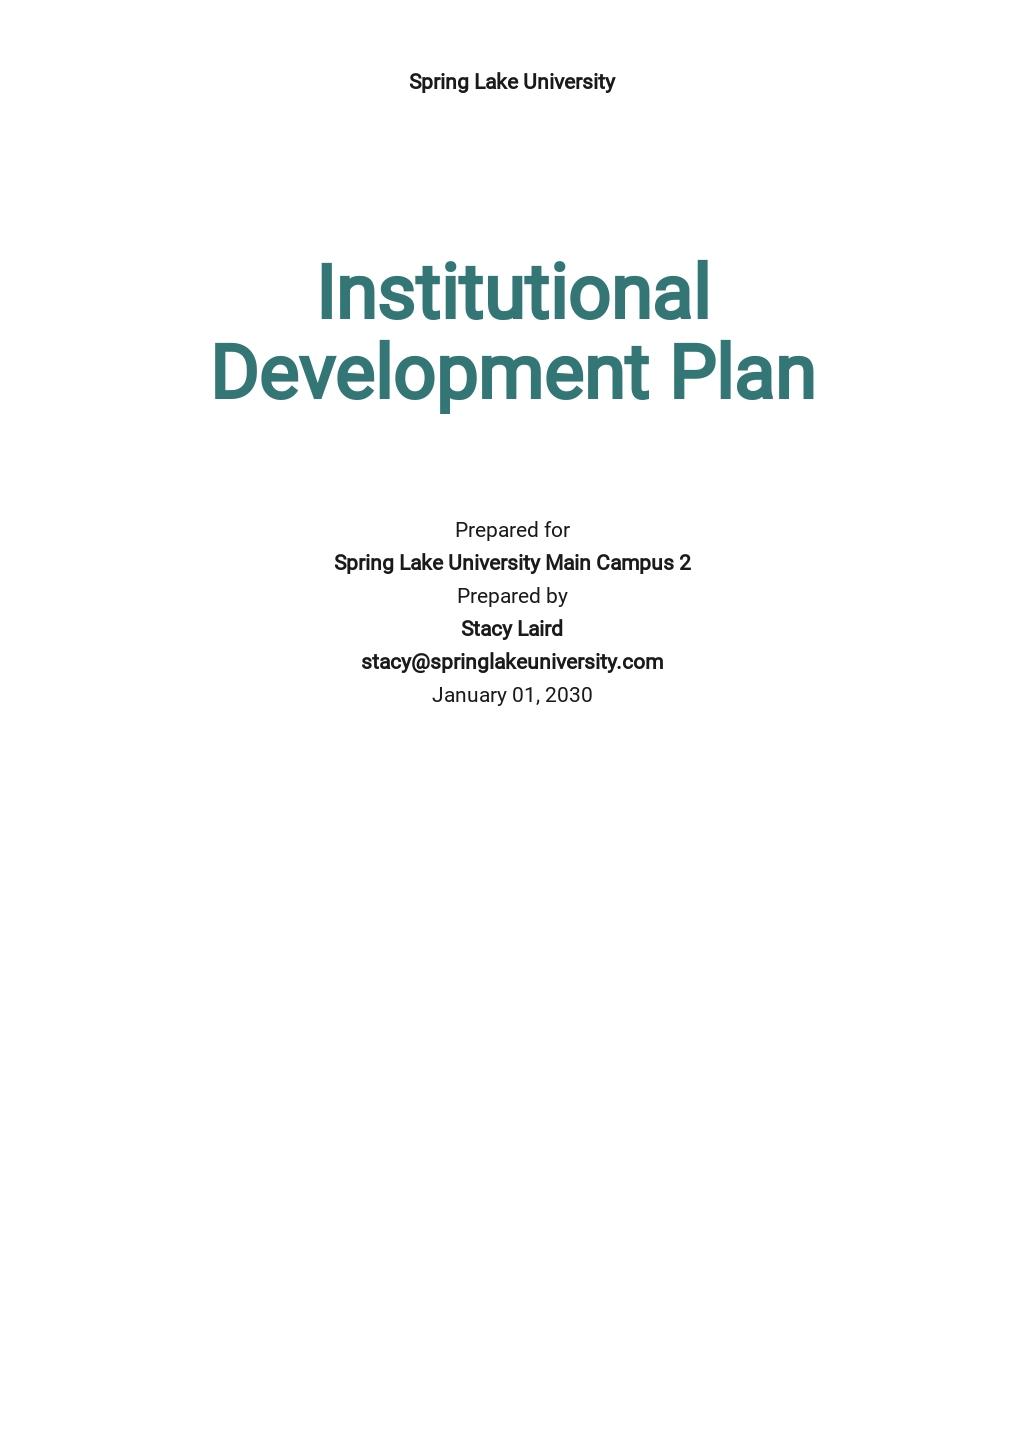 Institutional Development Plan Template.jpe